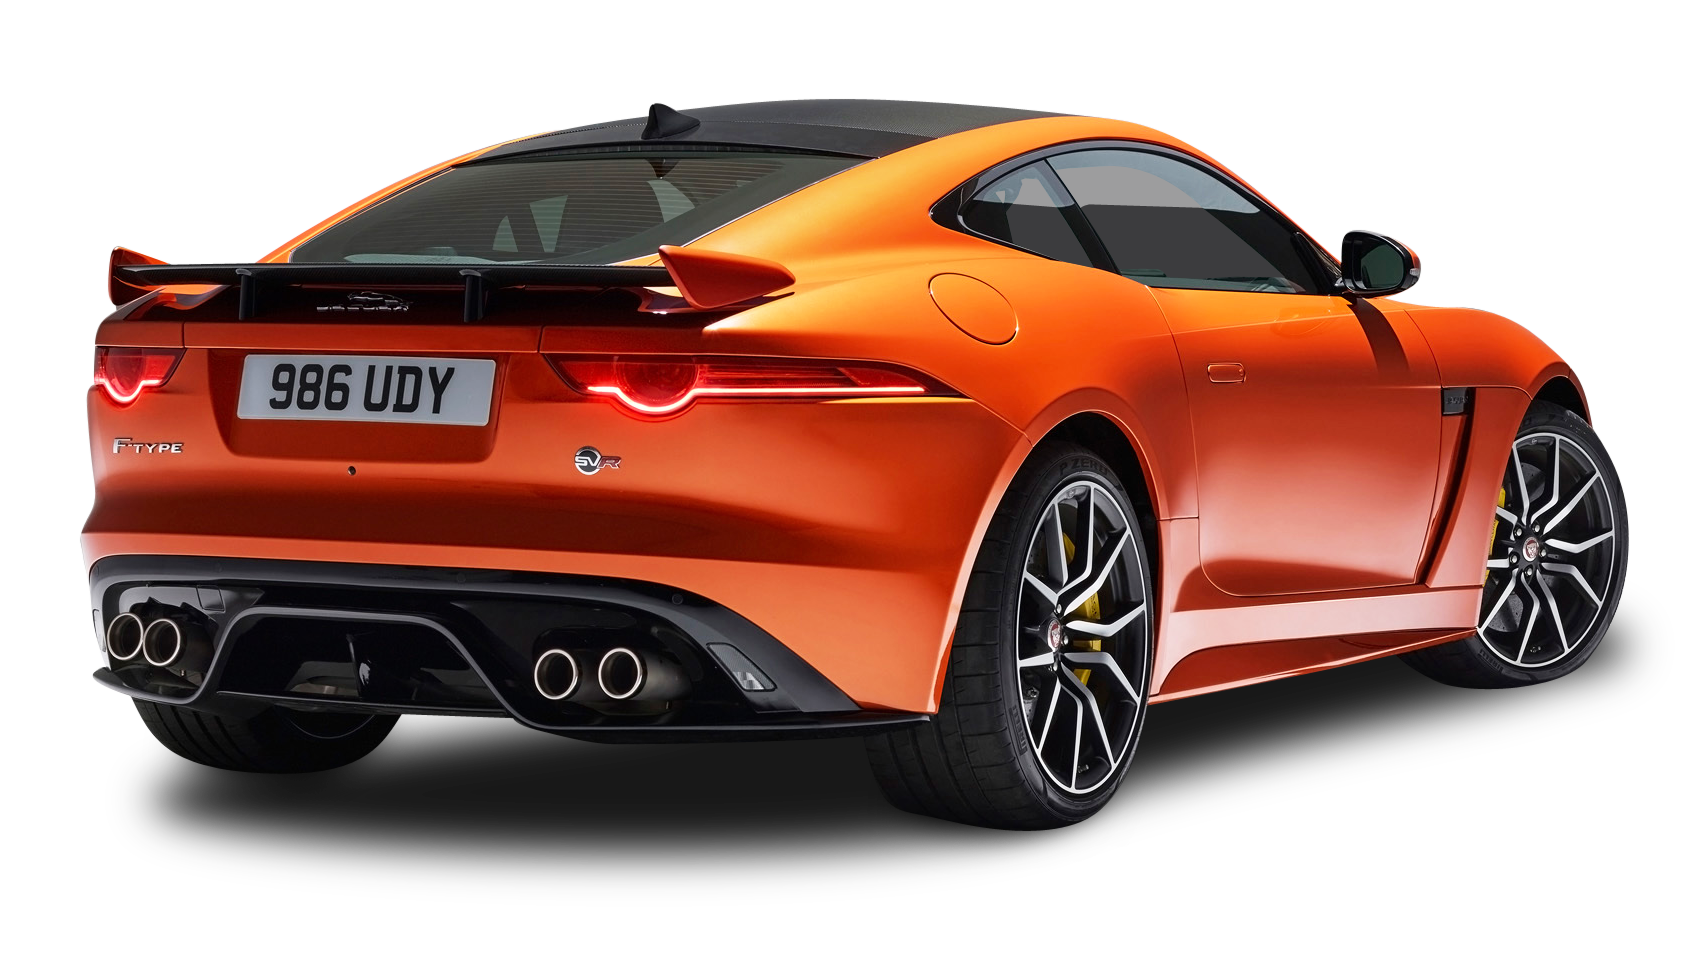 Orange Jaguar F Type SVR Coupe Back View Car